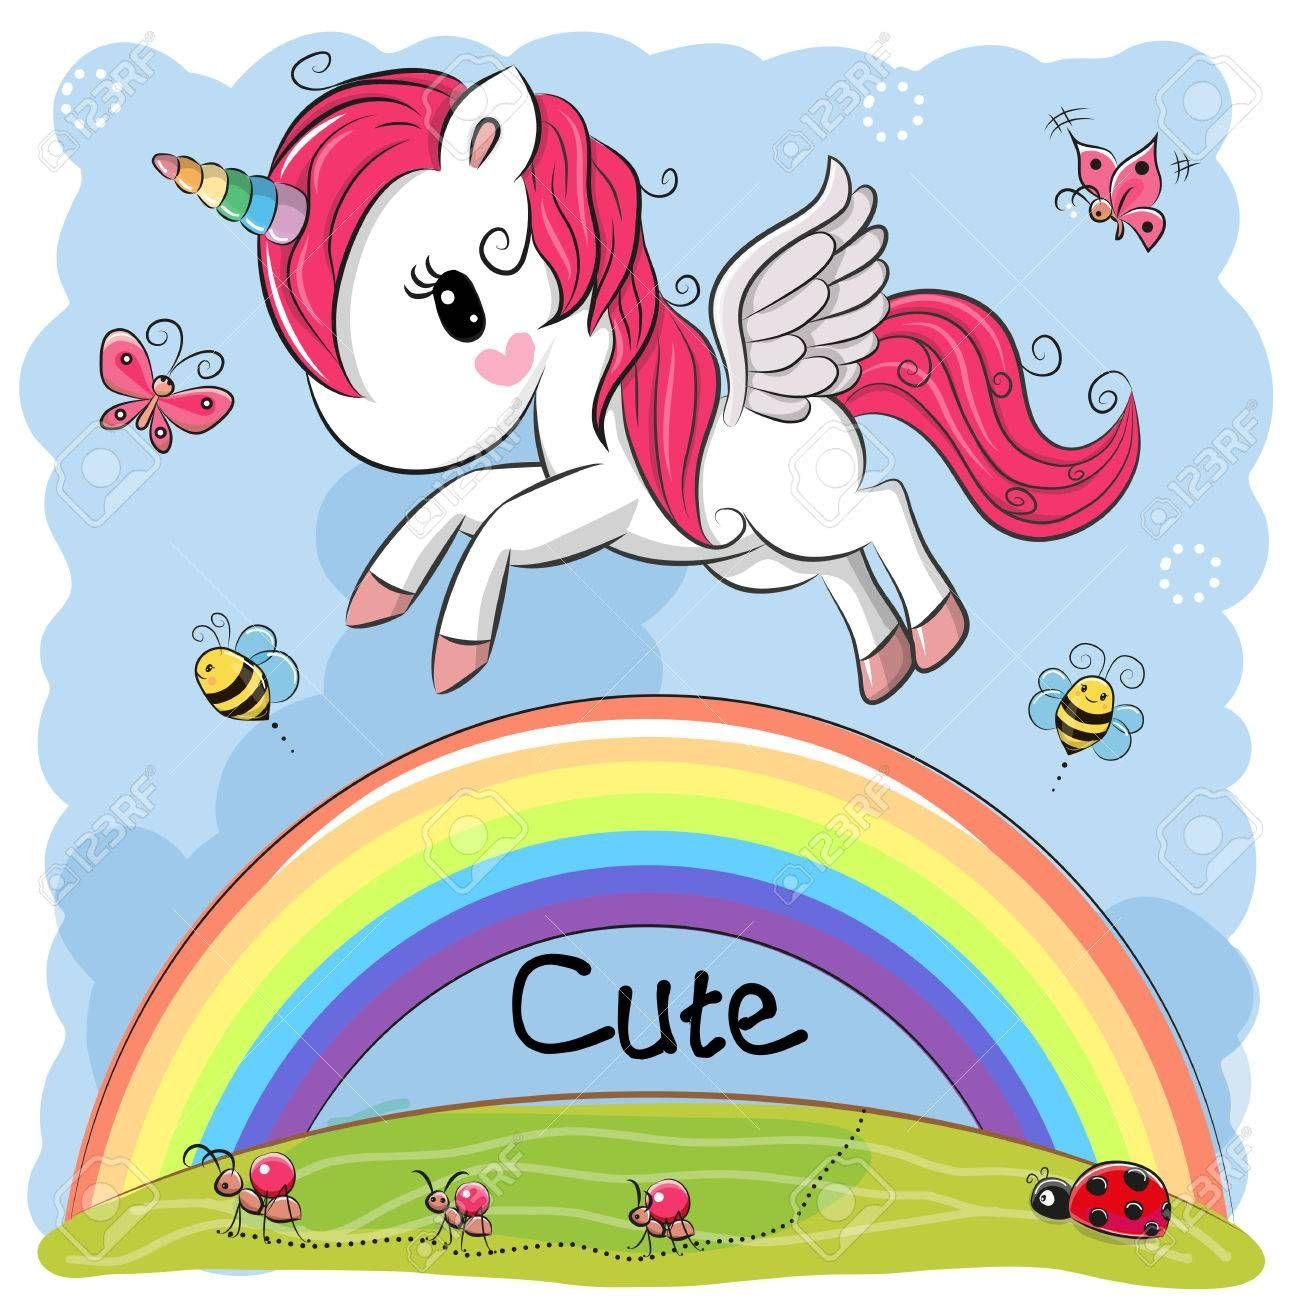 Cute Cartoon Unicorn Is Flying Over The Rainbow Illustration